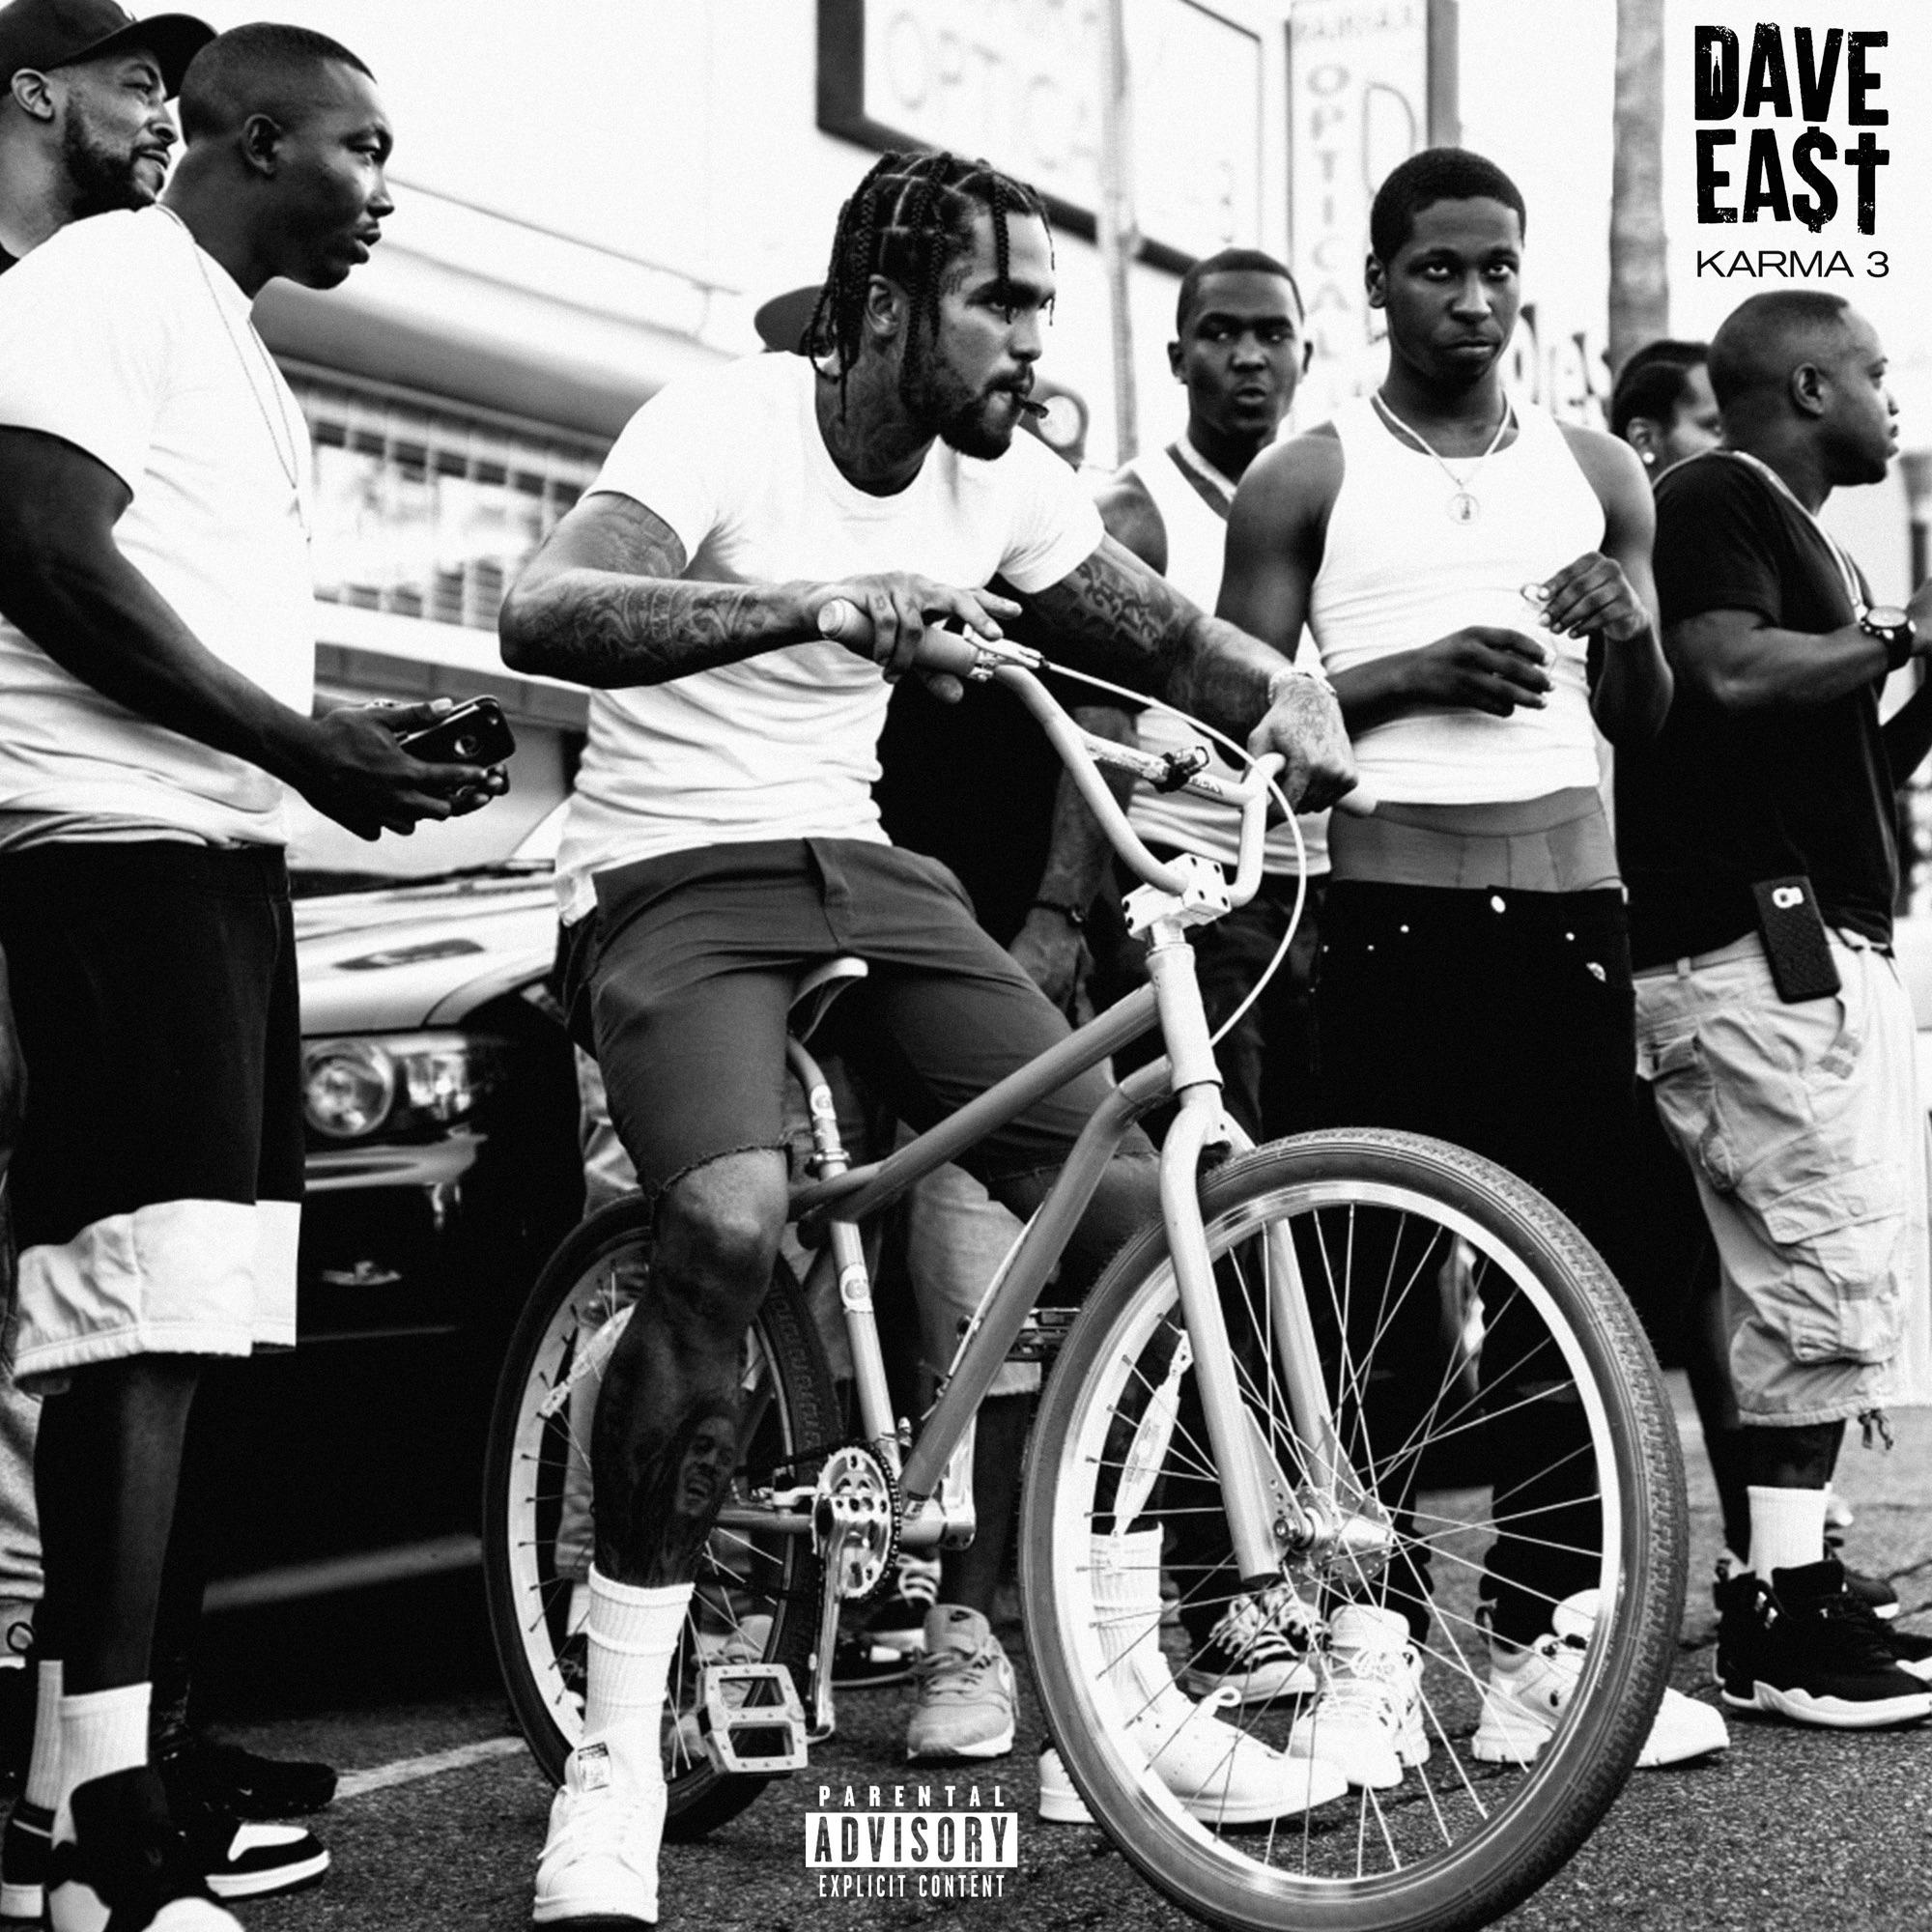 Dave East – Karma 3